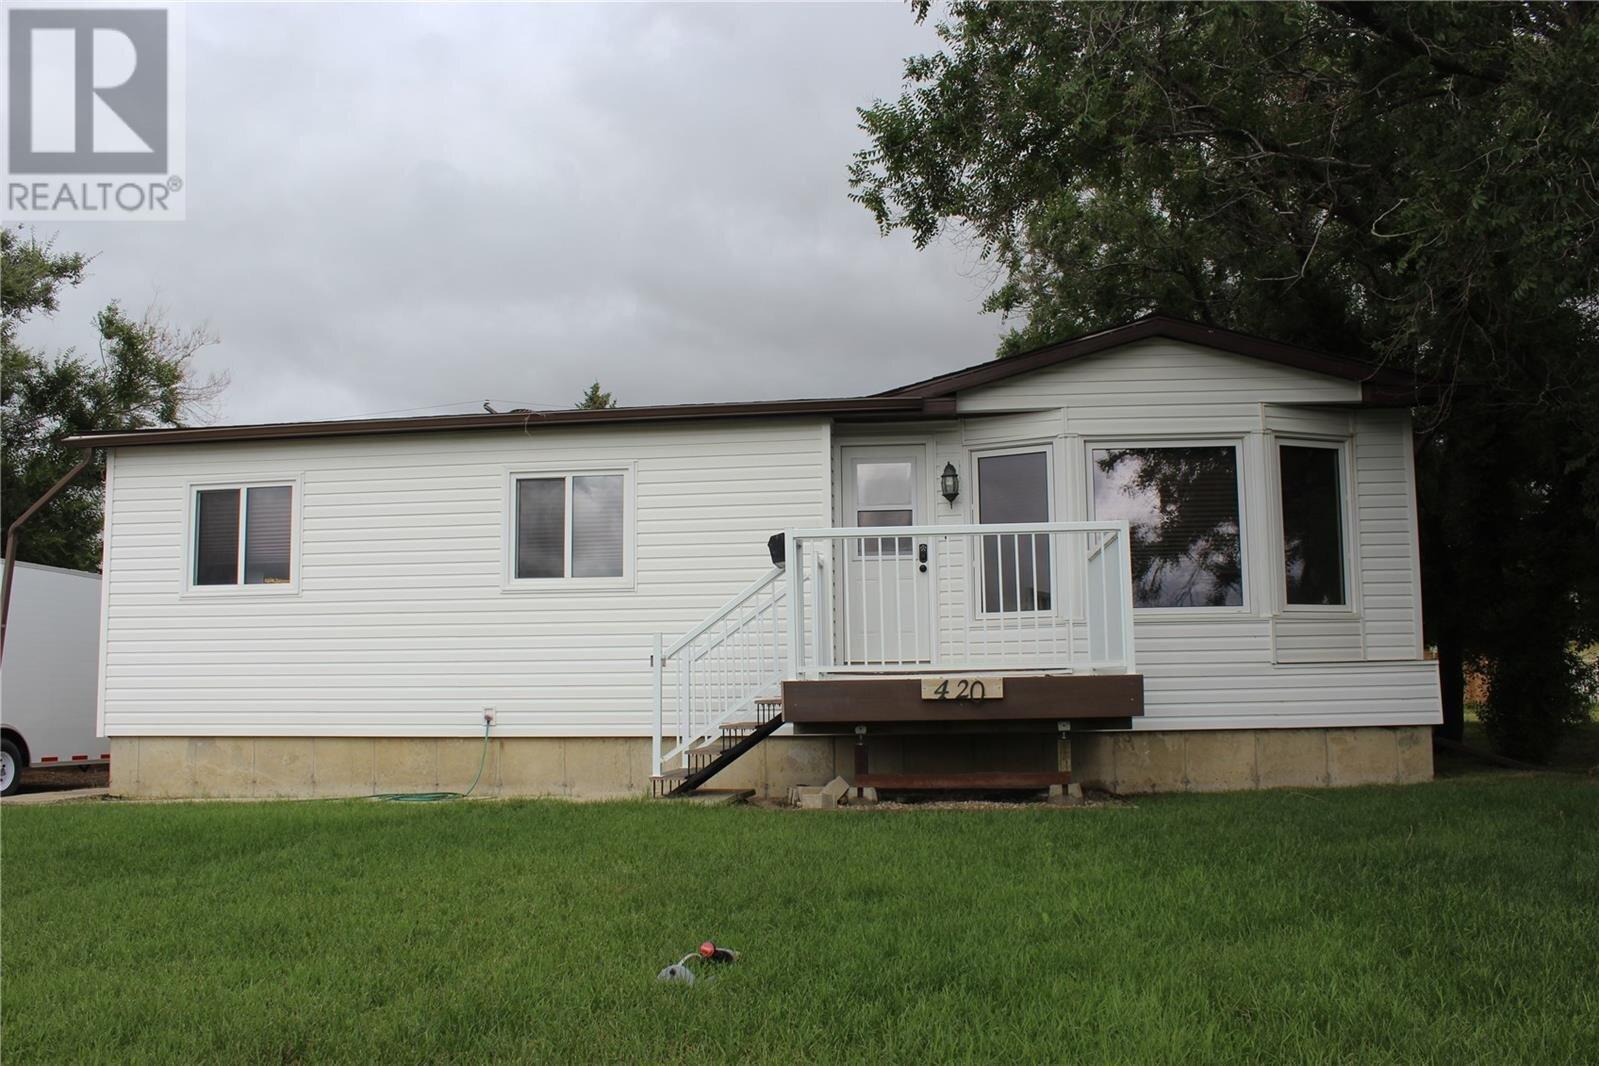 Residential property for sale at 420 5th St W Shaunavon Saskatchewan - MLS: SK821284